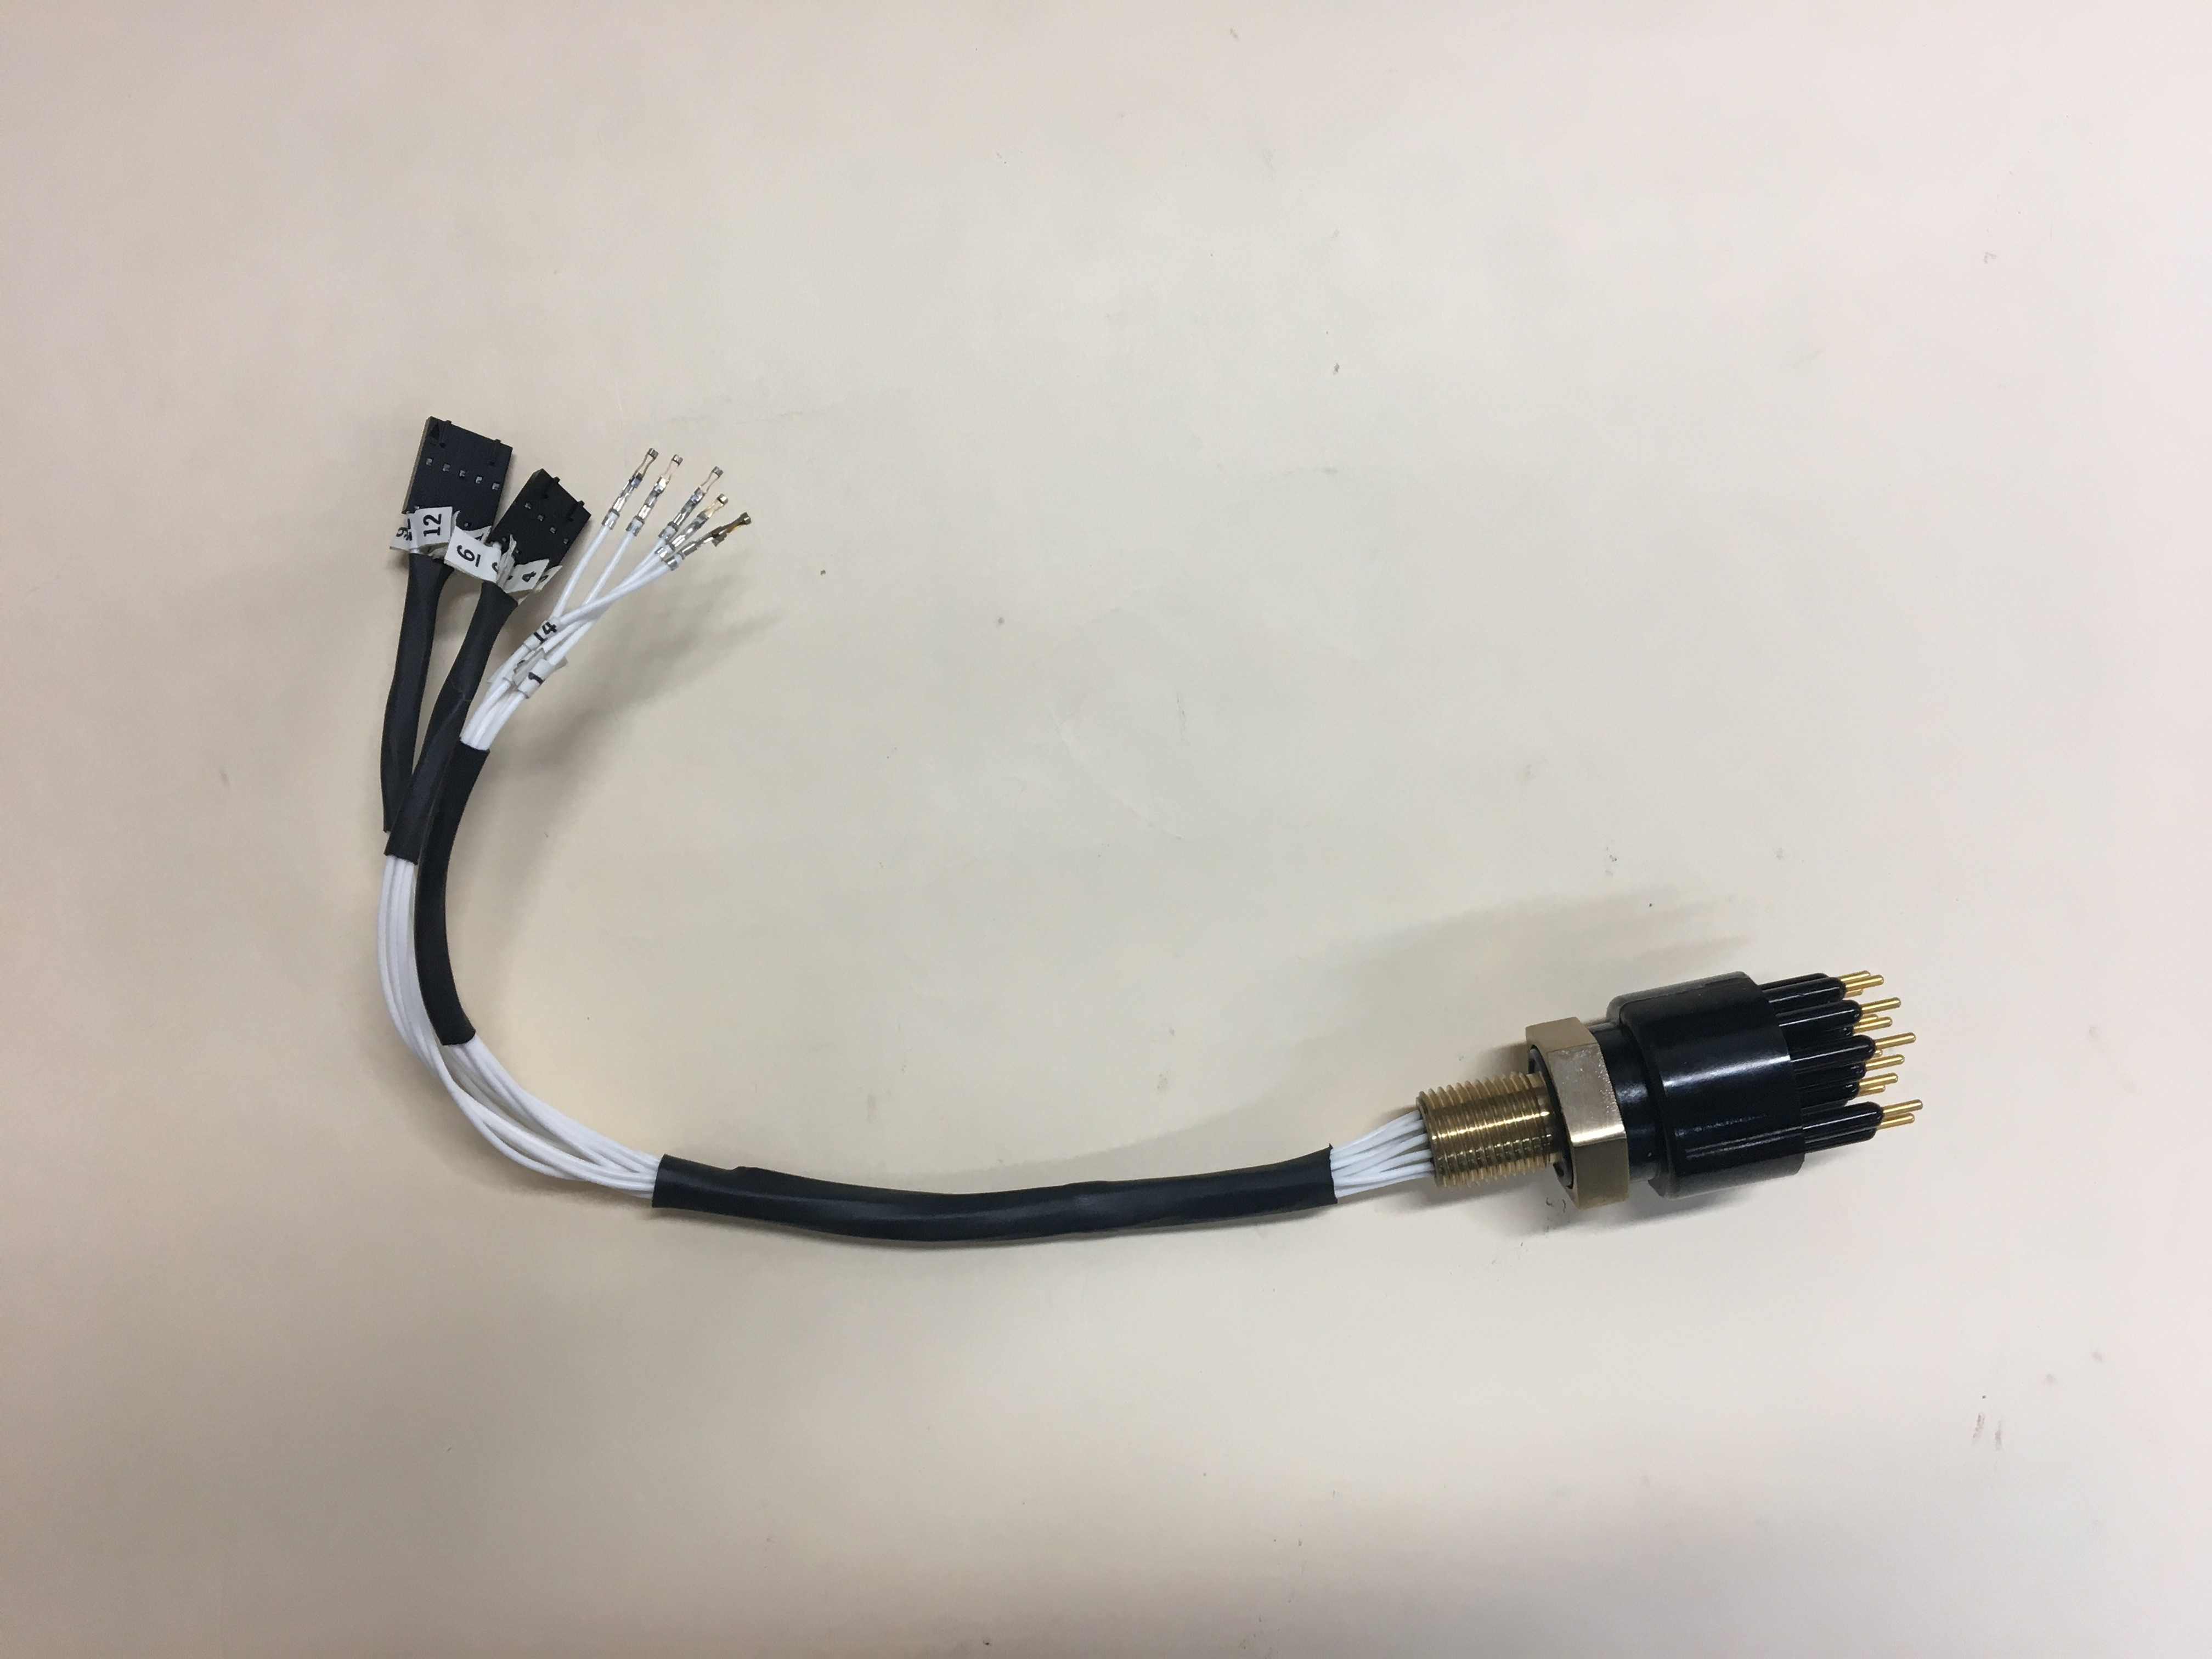 Wiring, 1018 Bulkhead Connector Assy.